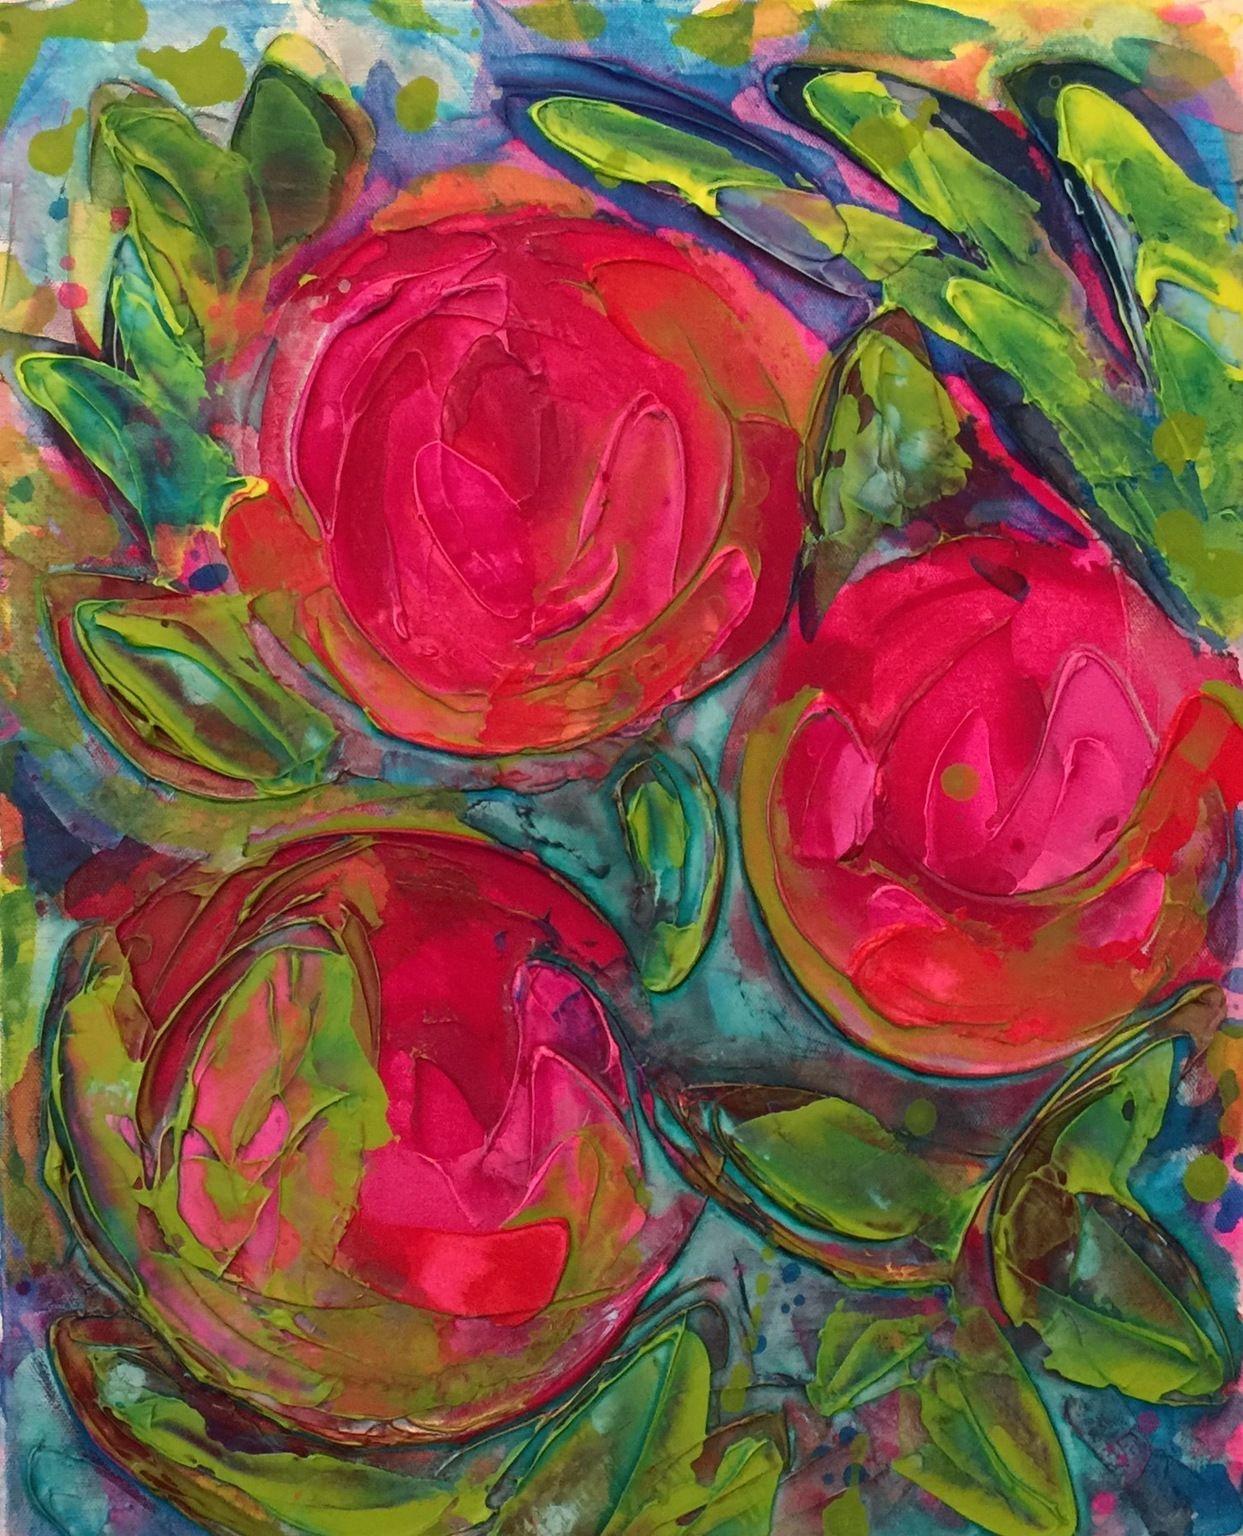 "'Peonies ' by Michael Bittle | $250 | 16""W x 20""H x 1.5""D | Original Art | http://vng.io/l/7mRCjEU9ZT @VangoArt"